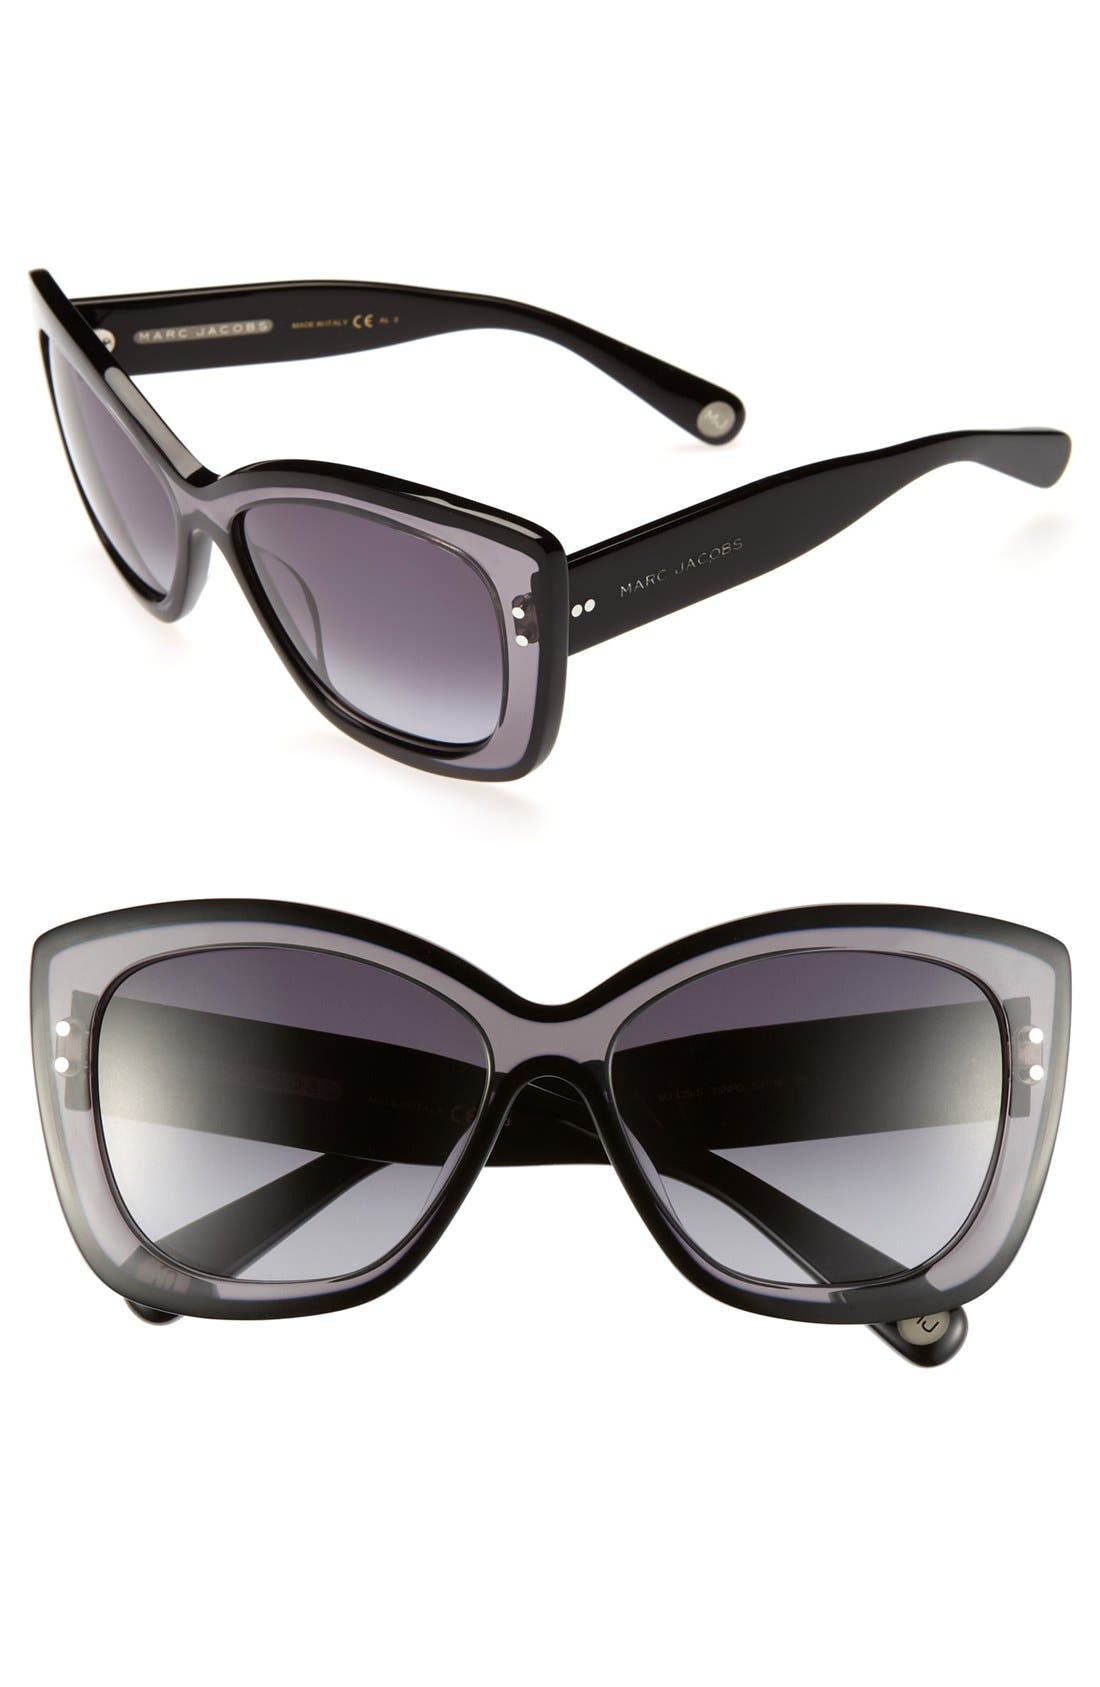 Main Image - MARC JACOBS 58mm Retro Sunglasses